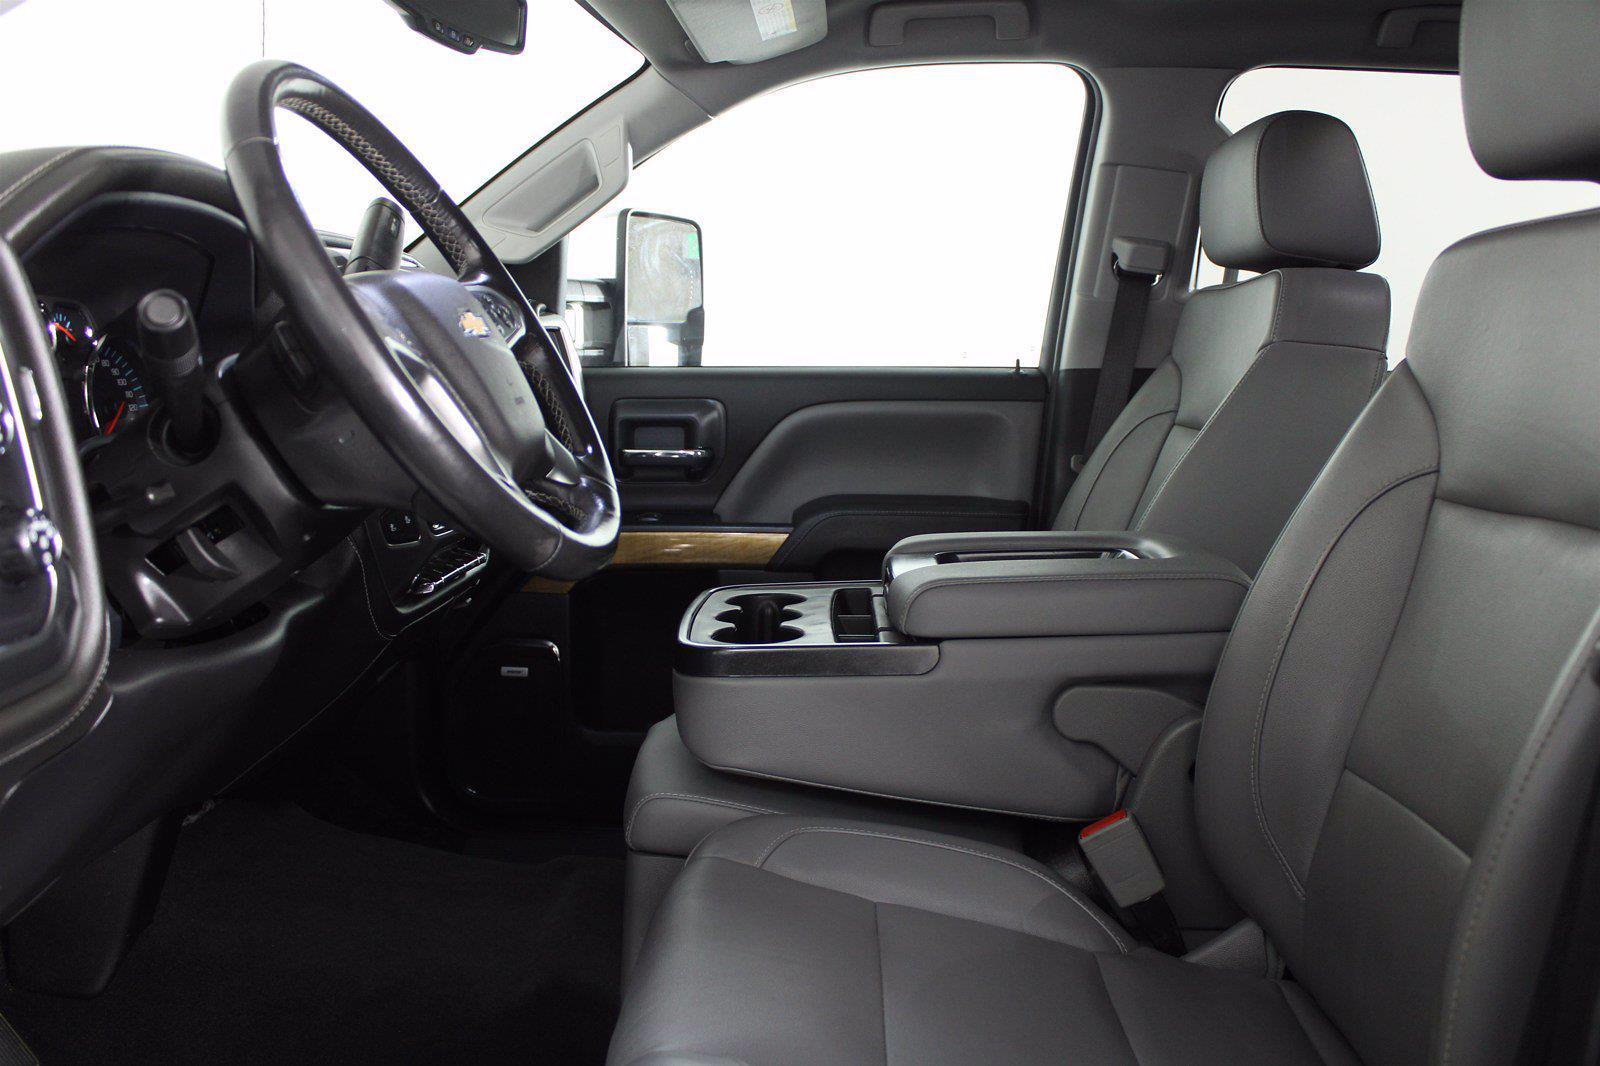 2019 Silverado 3500 Crew Cab 4x4,  Pickup #D420022A - photo 23